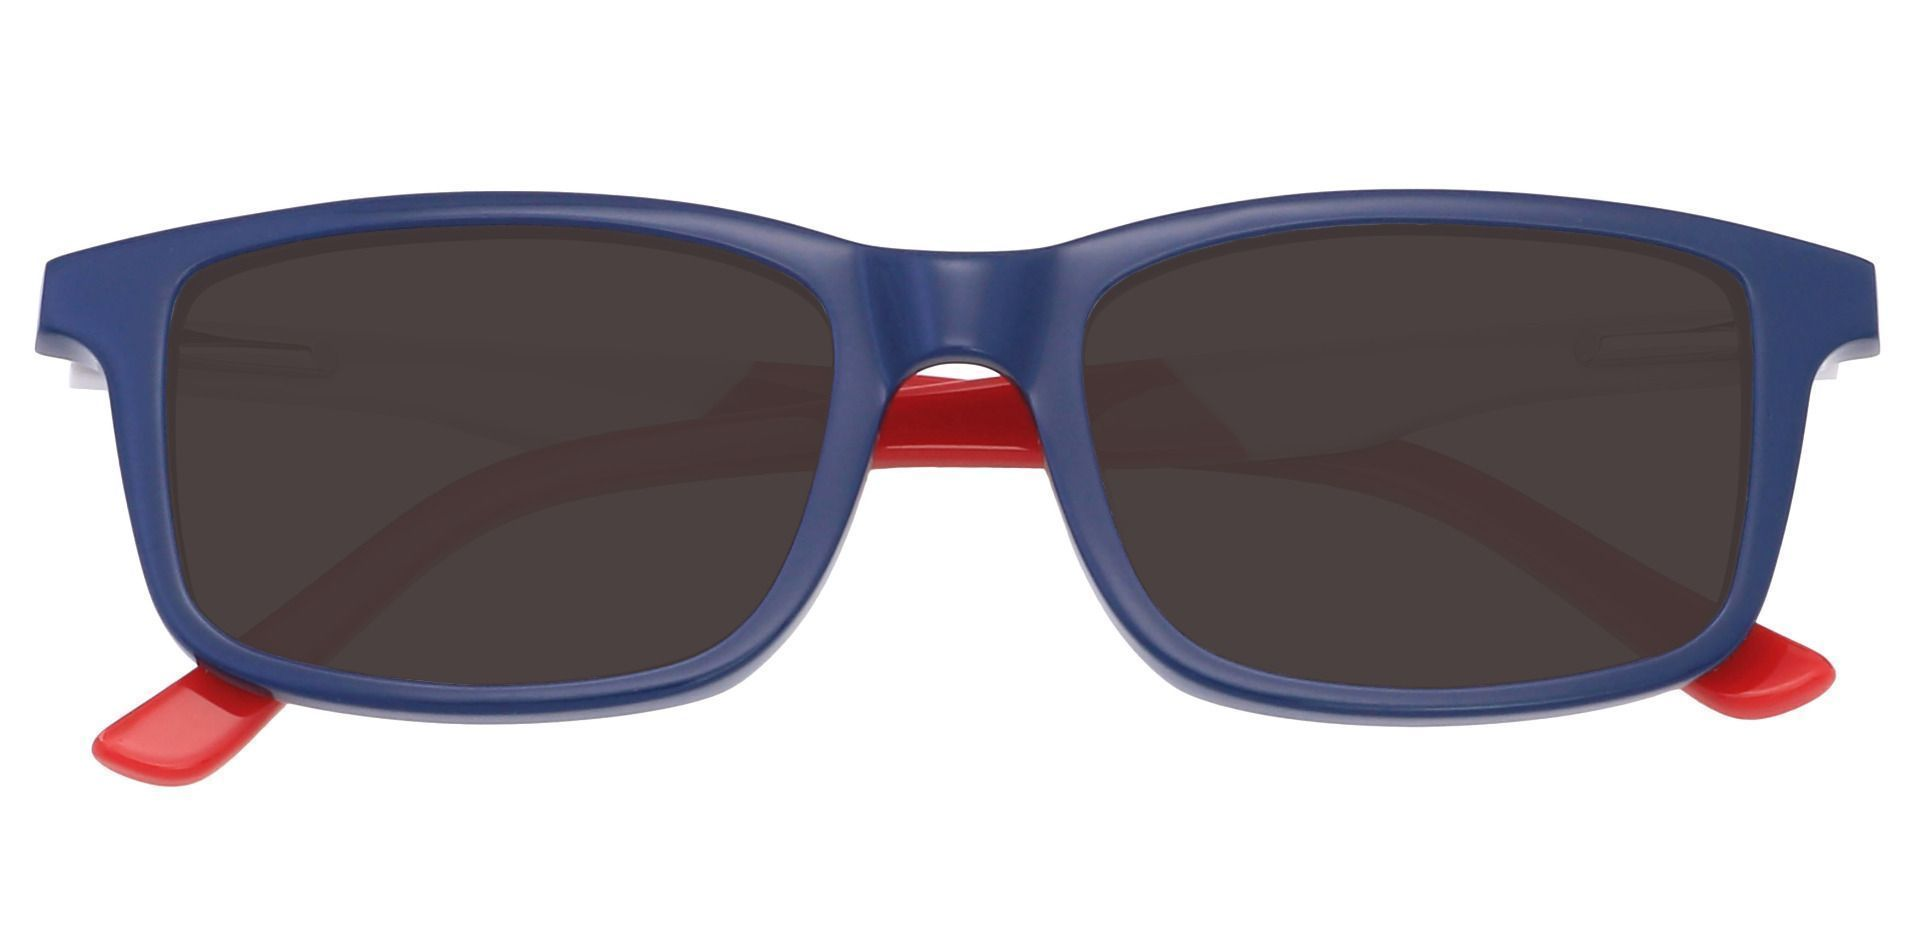 Hub Rectangle Single Vision Sunglasses - Blue Frame With Gray Lenses